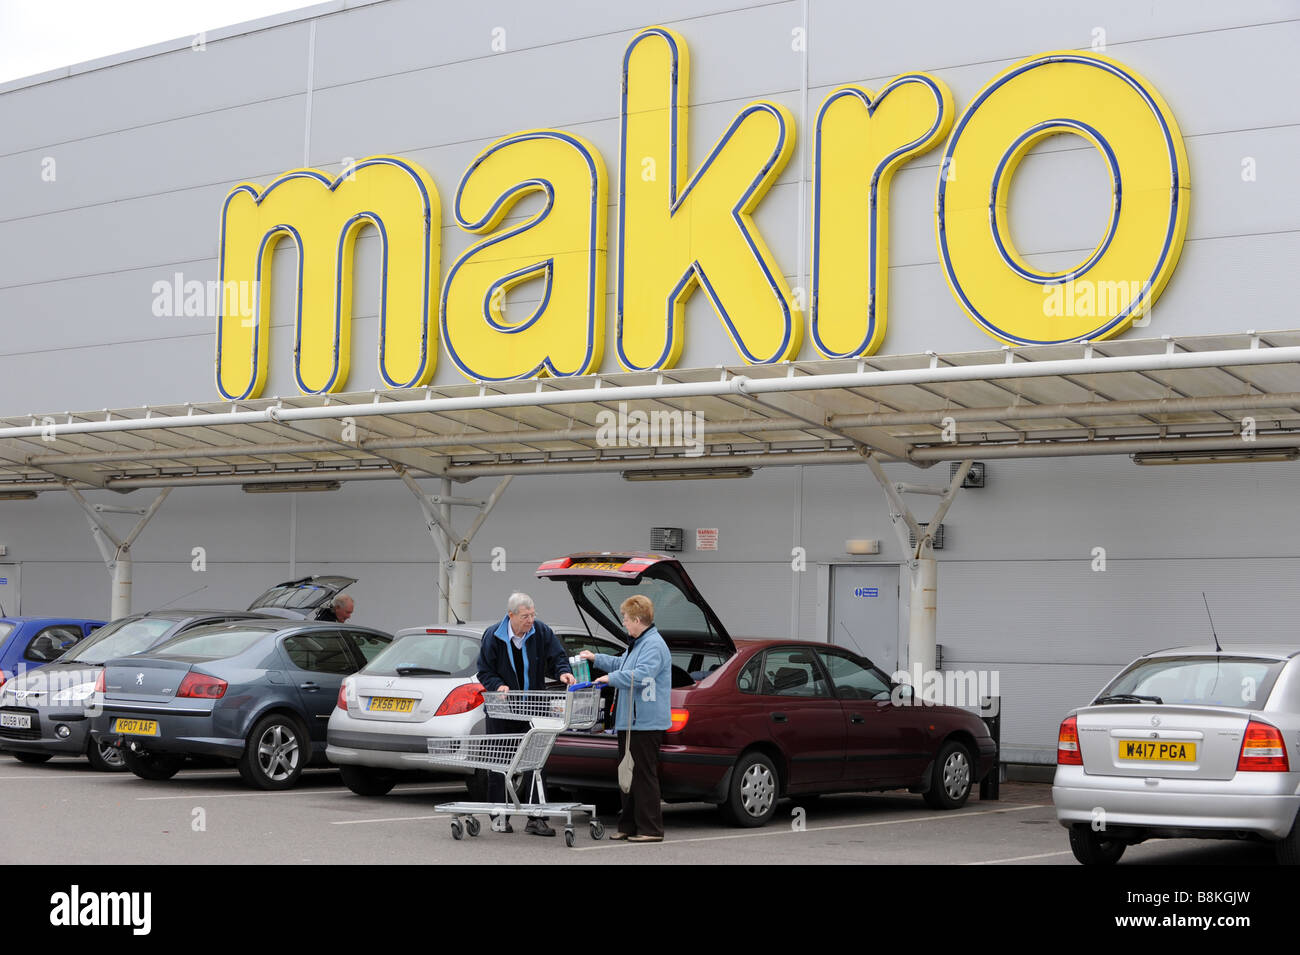 Shoppers outside Makro cash and carry supermarket Wednesfield Wolverhampton West Midlands England Uk - Stock Image